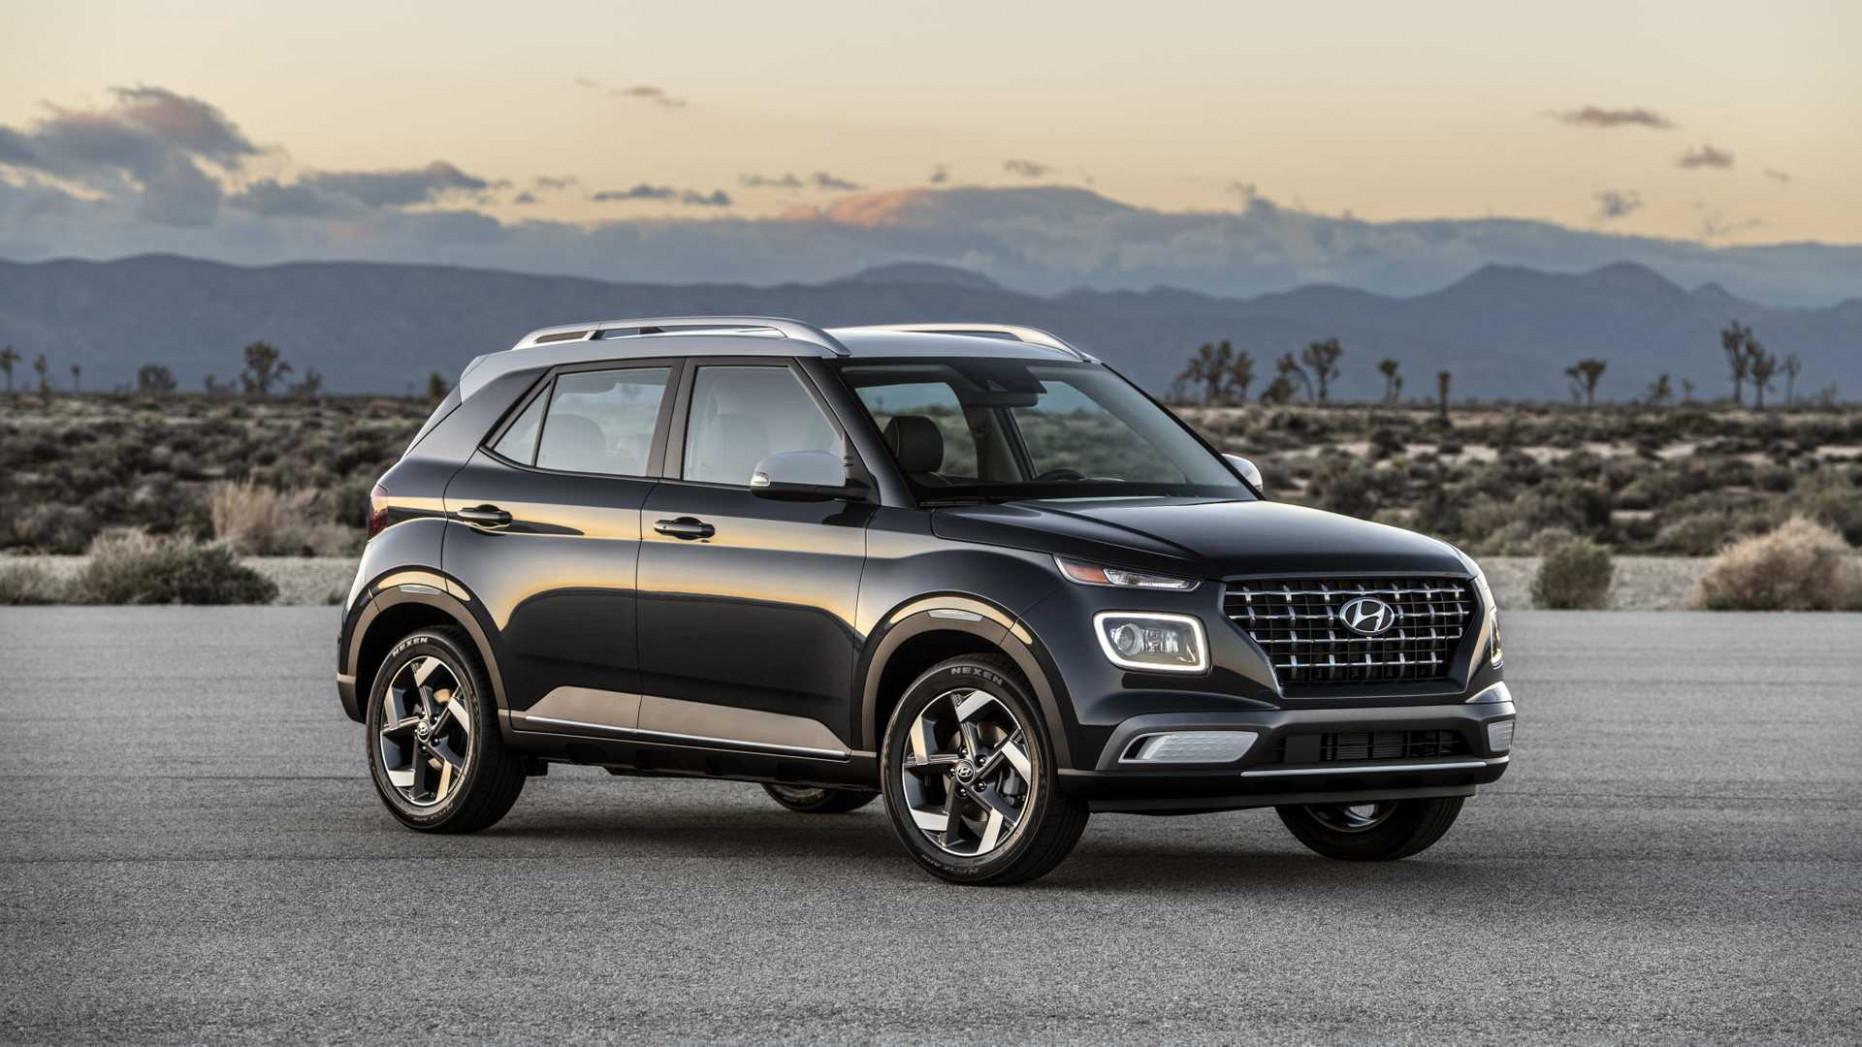 Concept Hyundai Venue 2022 Price